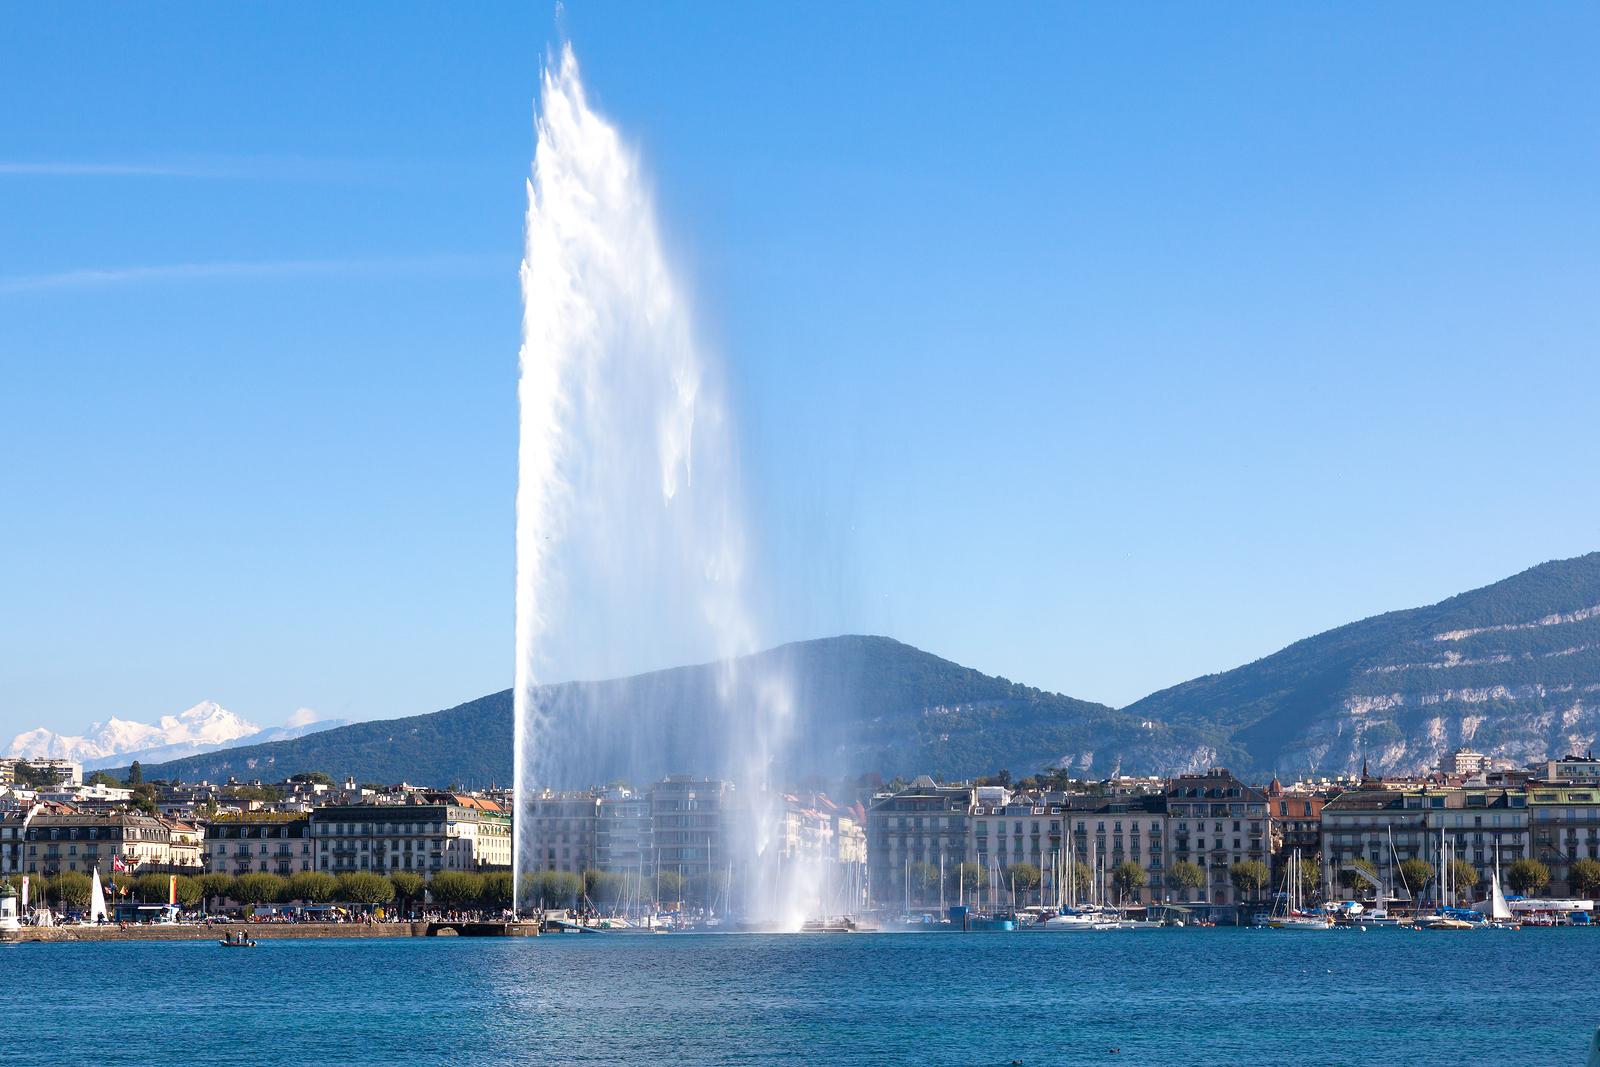 bigstock-Geneva-Water-Fountain-61454570-2-2-copie